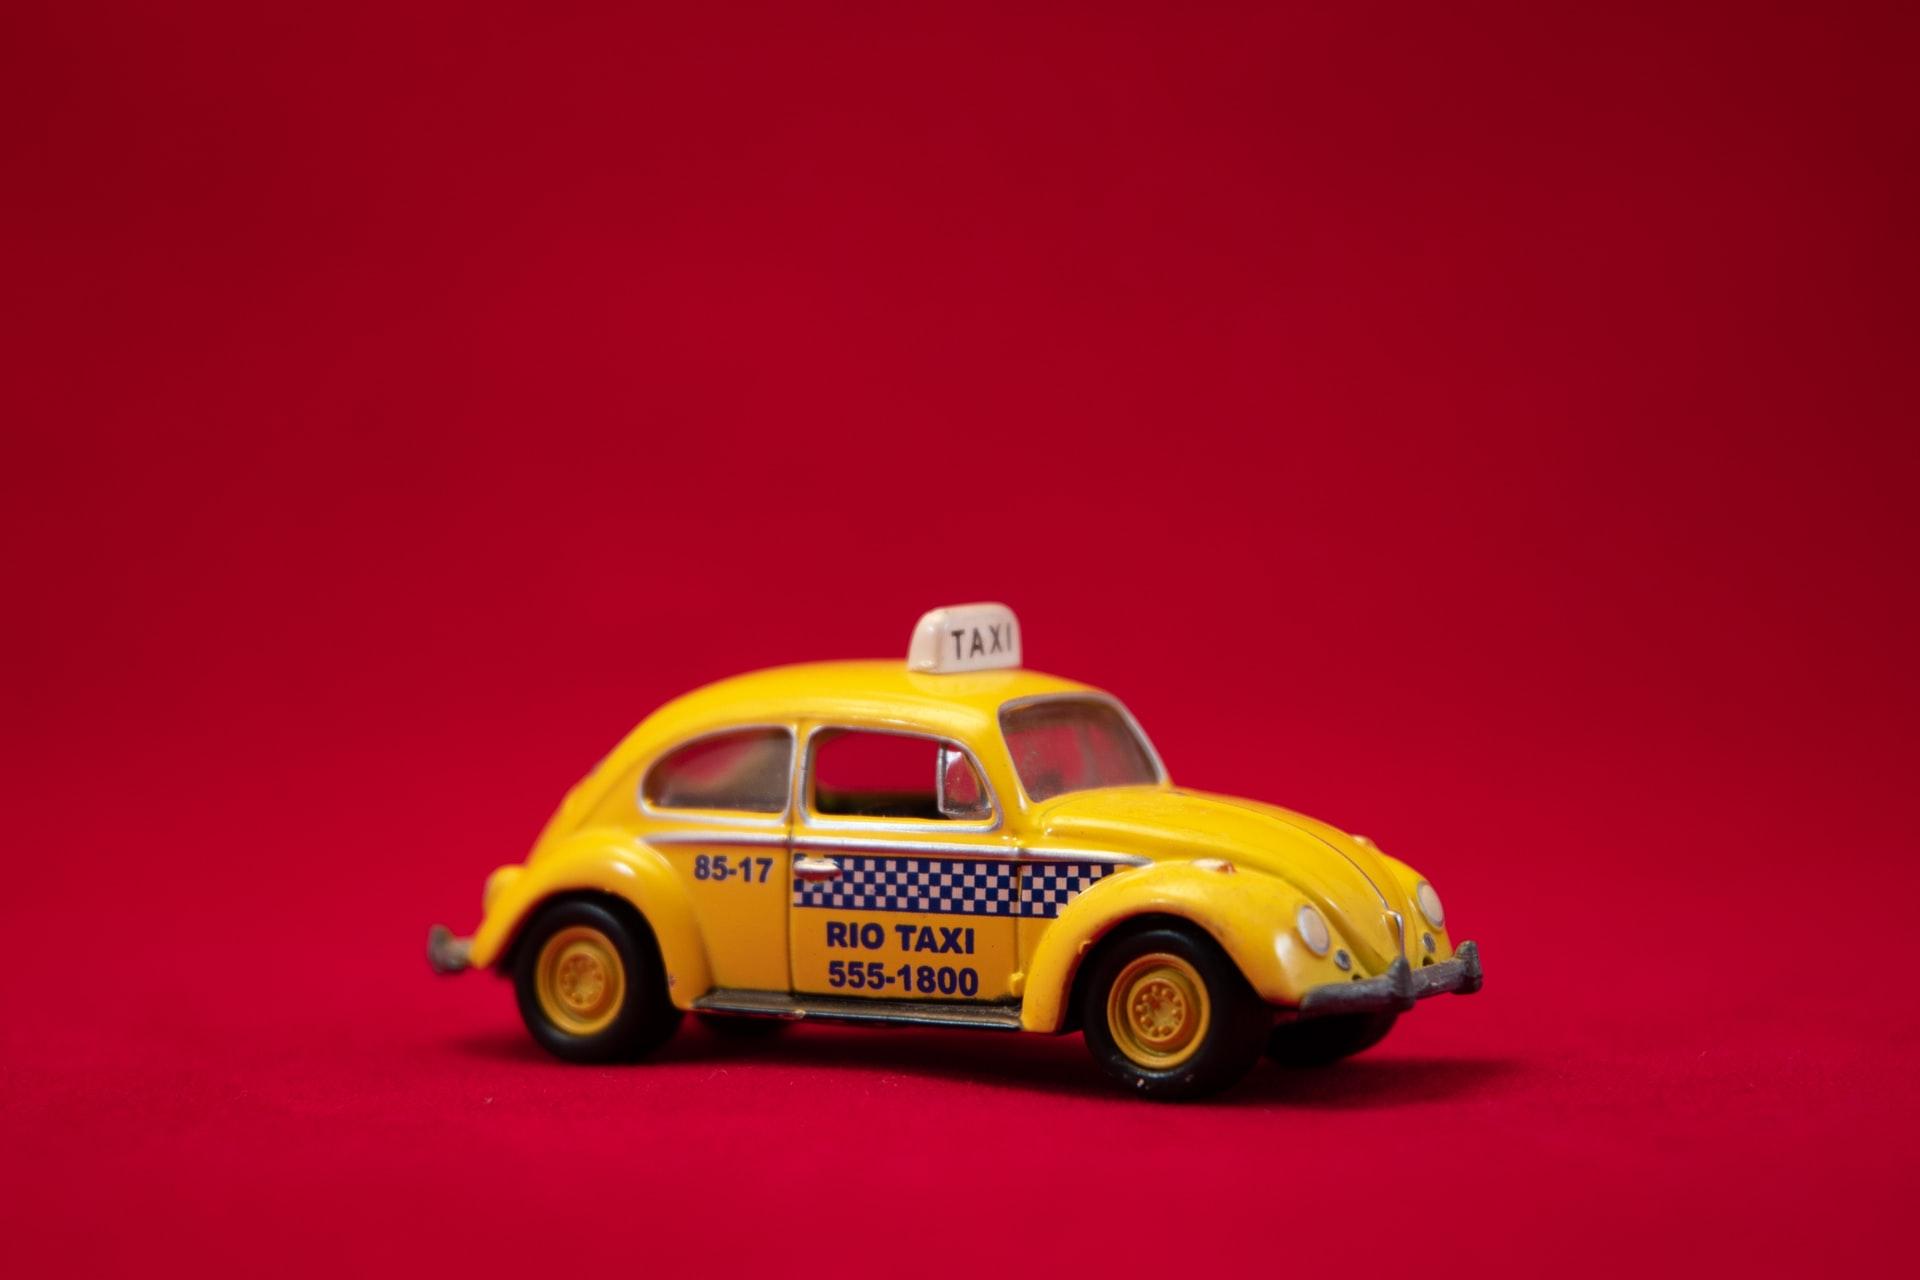 Taxi-bil